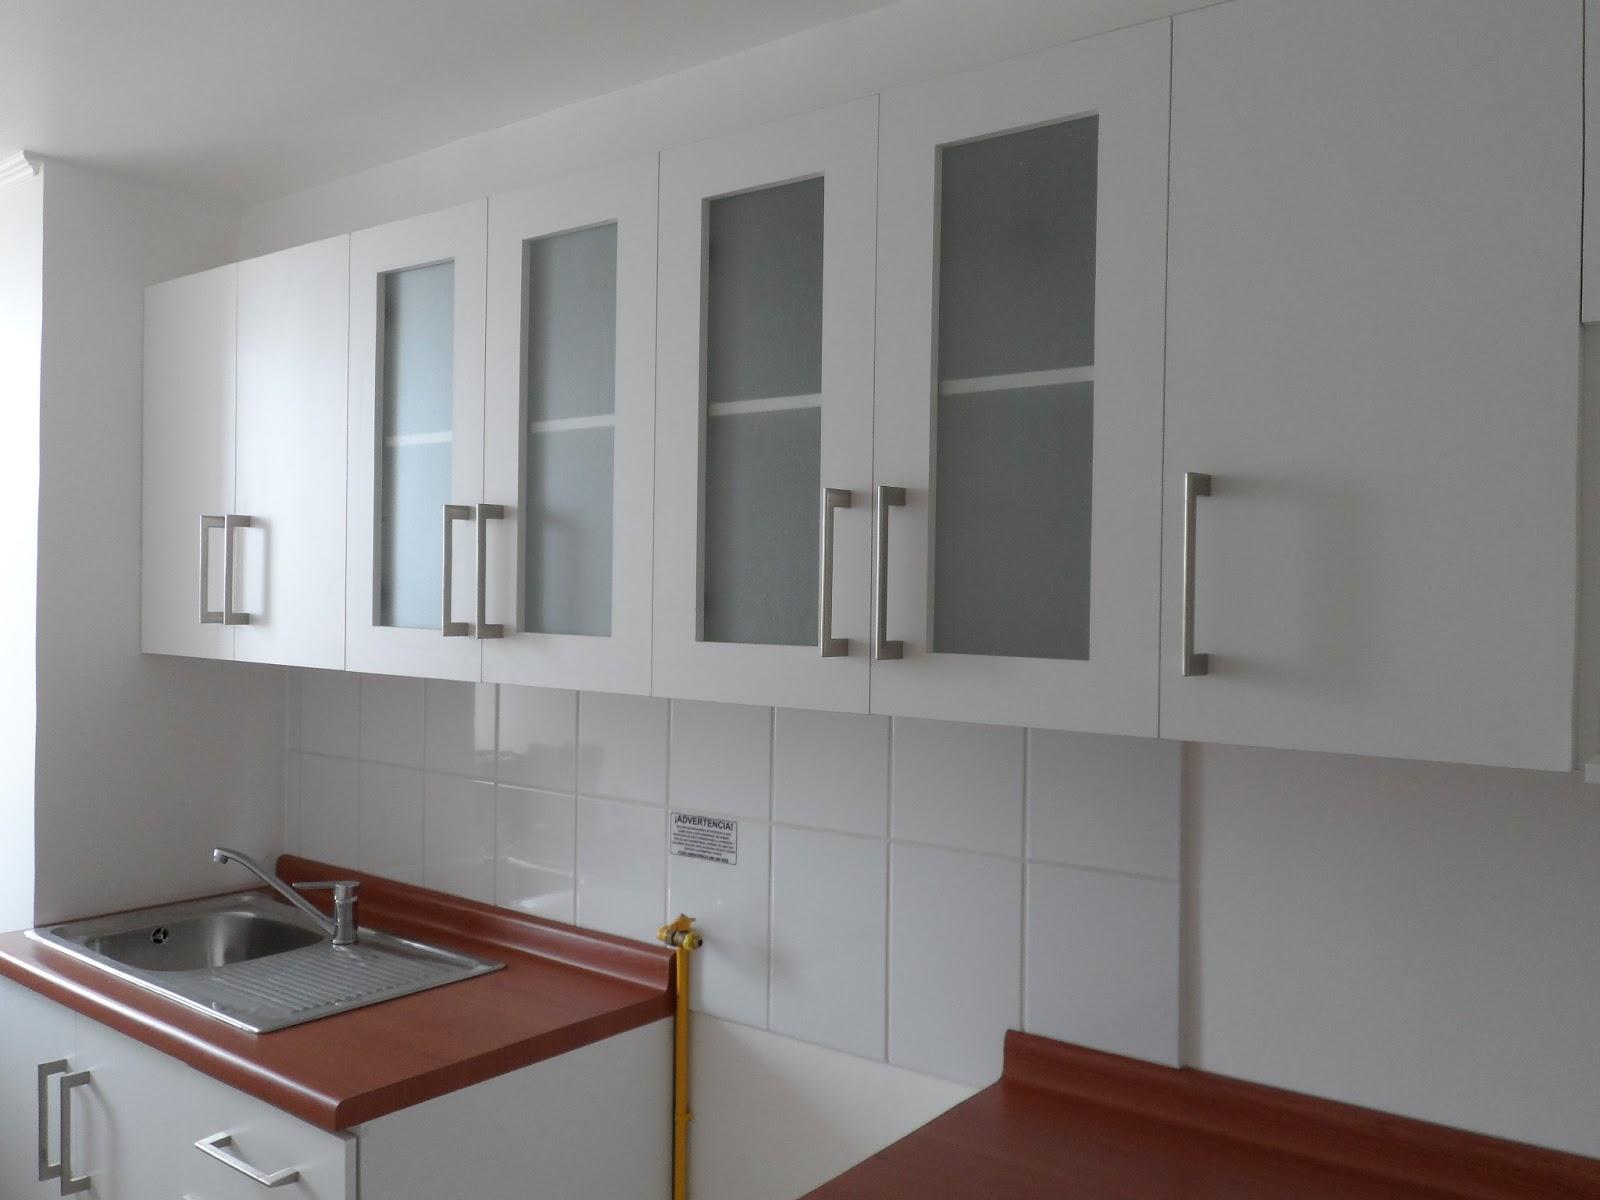 Muebles soluciones iquique cocinas for Muebles de cristal